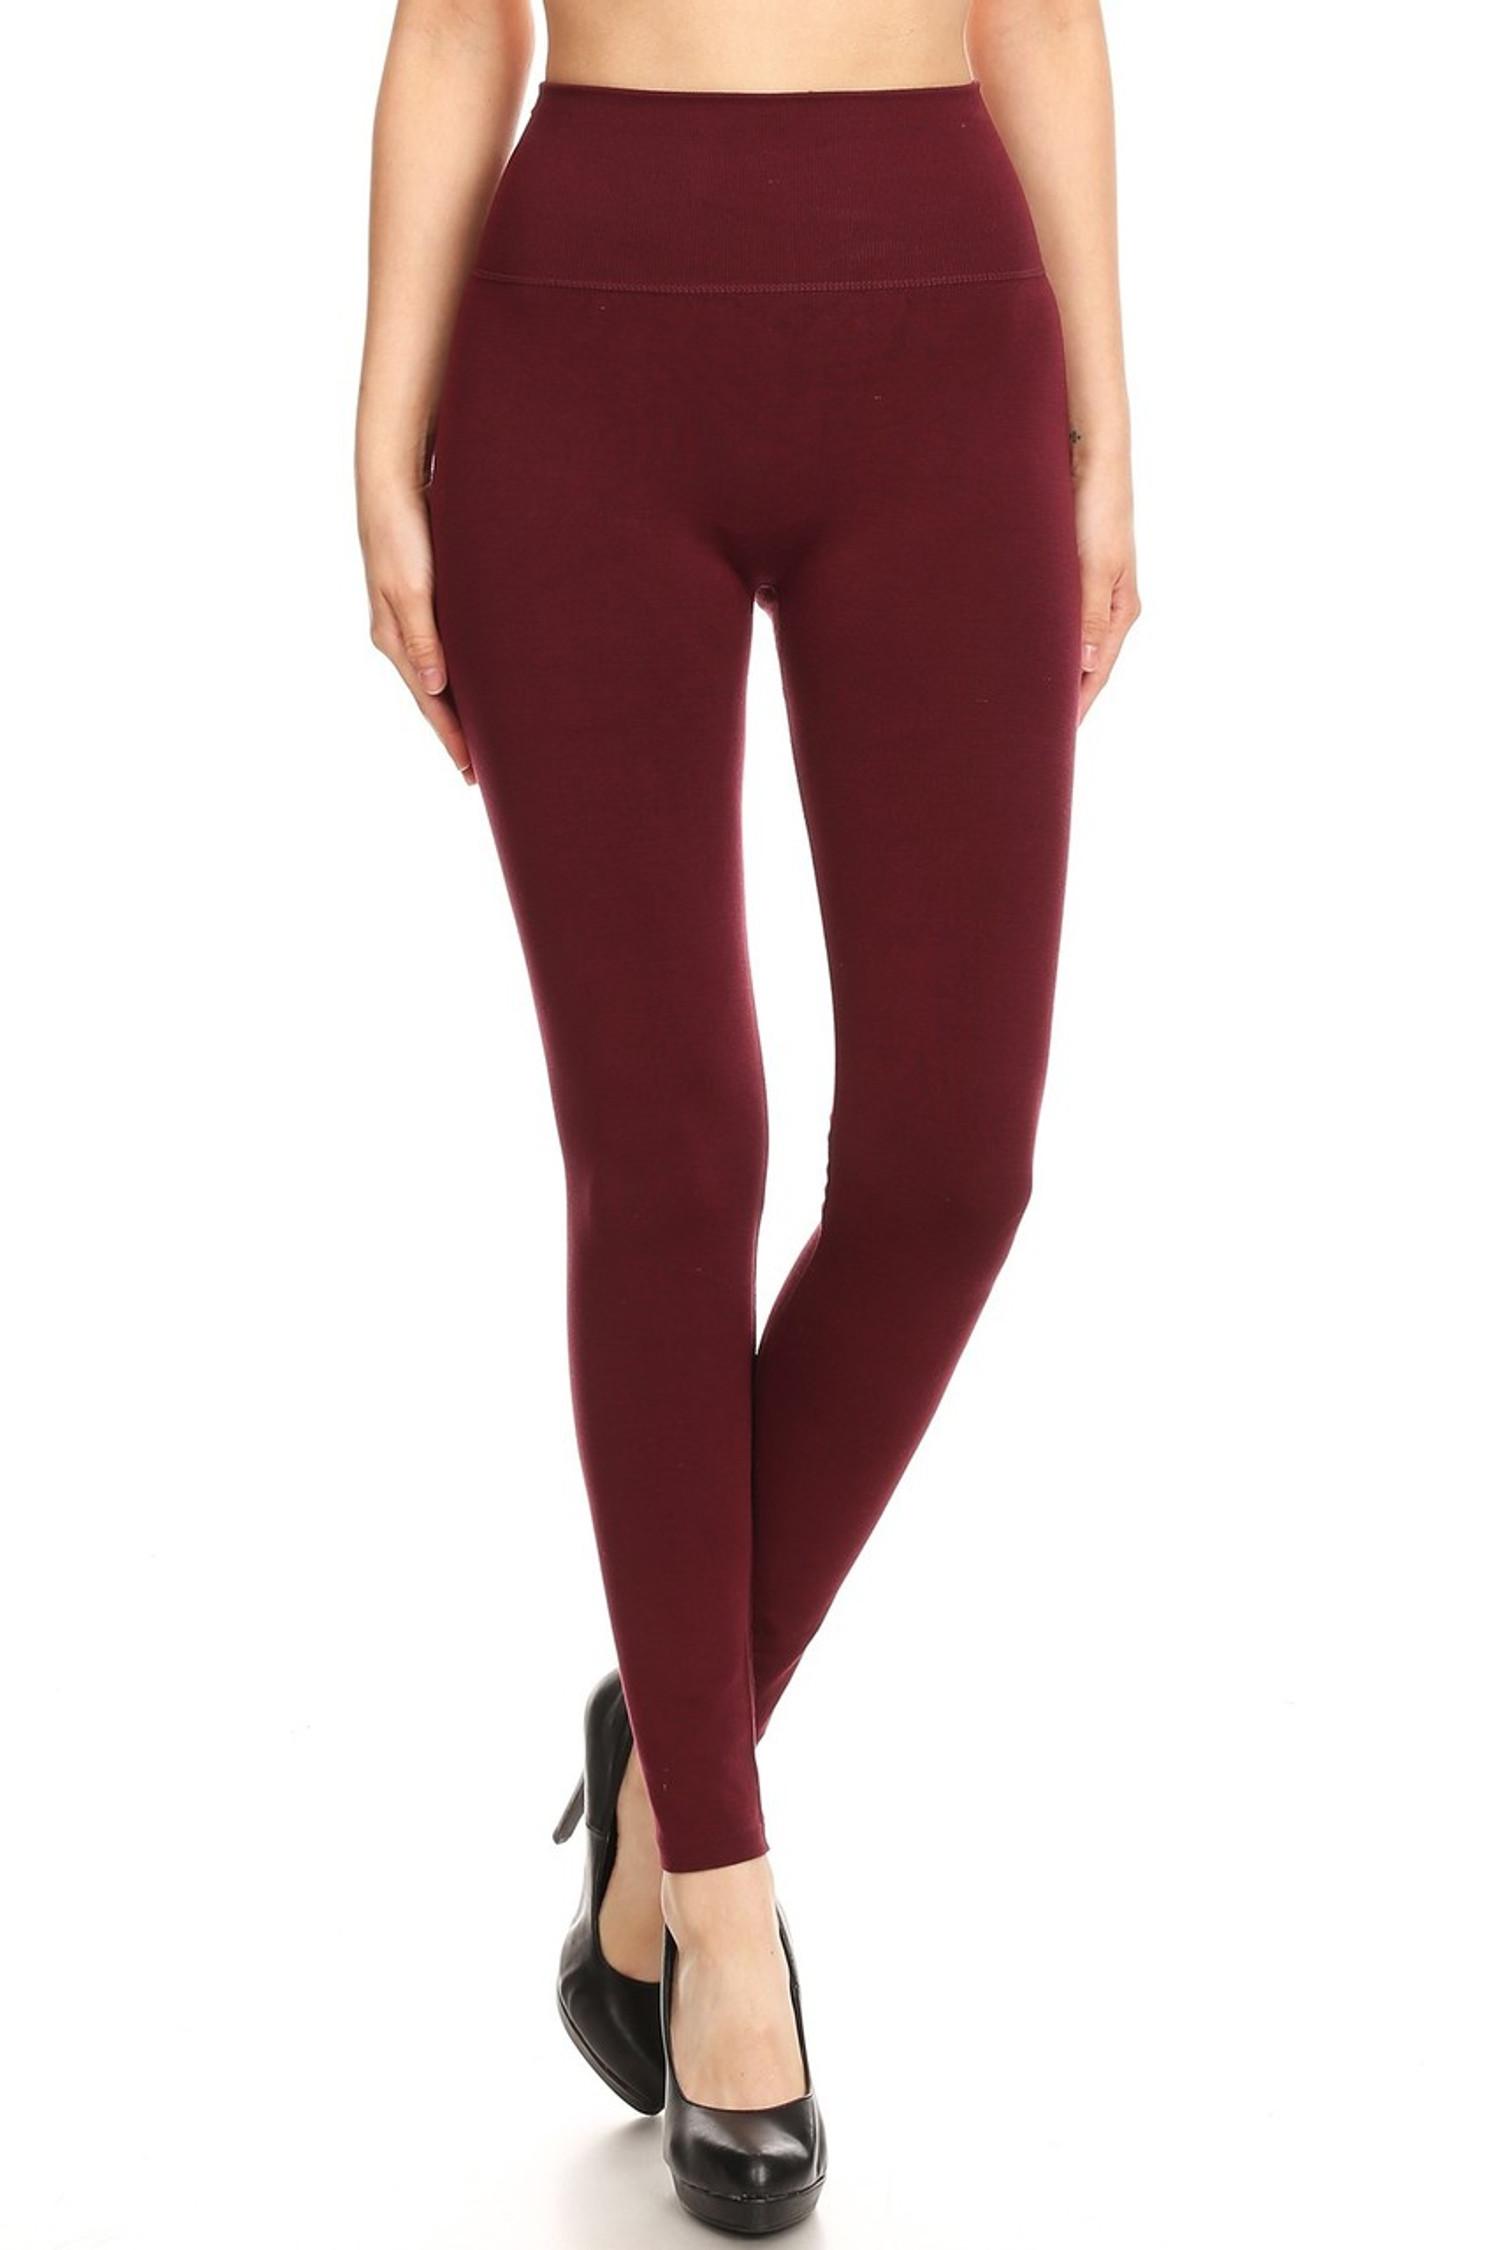 Burgundy Premium High Waisted Basic Leggings